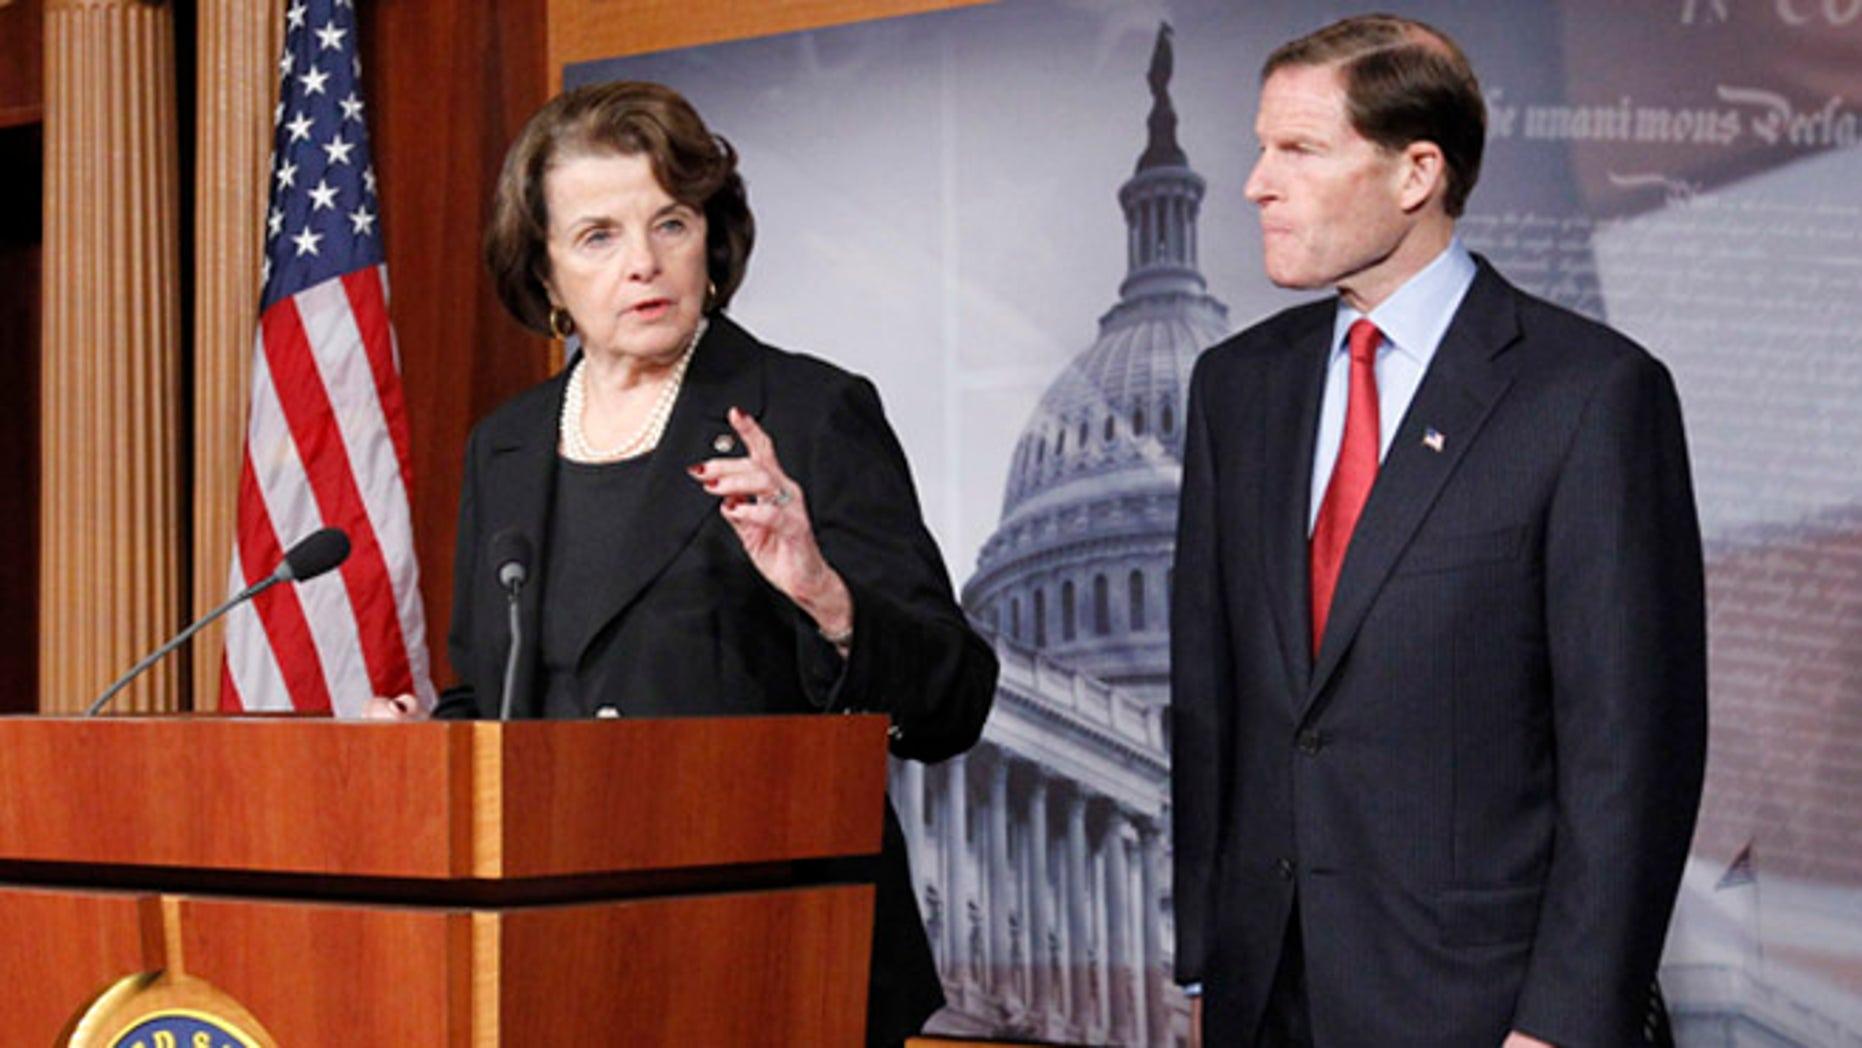 Dec. 21, 2012: Sen. Dianne Feinstein, left, speaks as she and Sen. Richard Blumenthal, right, discuss gun control on Capitol Hill.